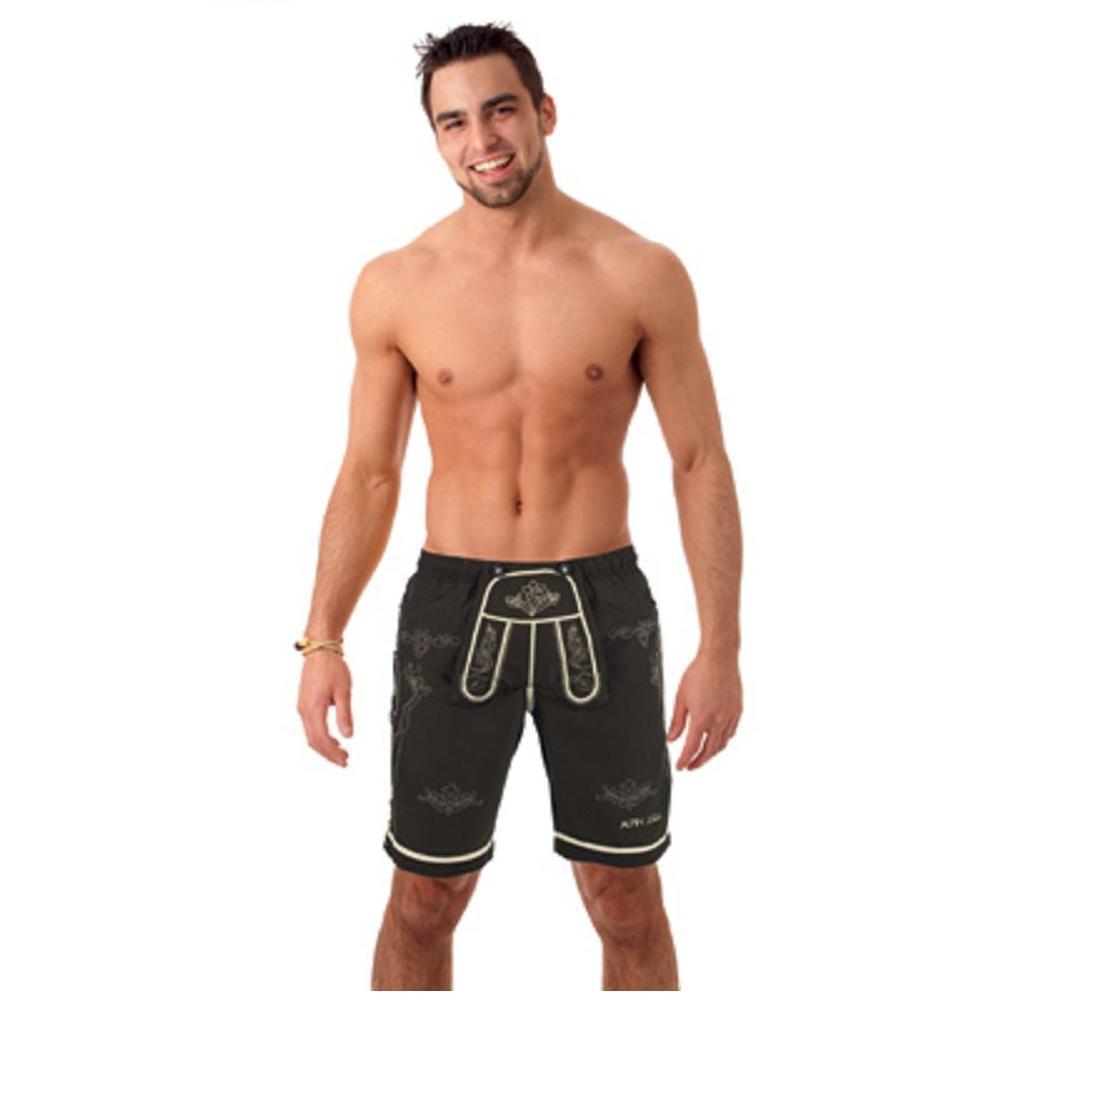 alpin bayrische trachten badehose trachten shorts badeshorts lederhosen optik herren gr 54 xl. Black Bedroom Furniture Sets. Home Design Ideas